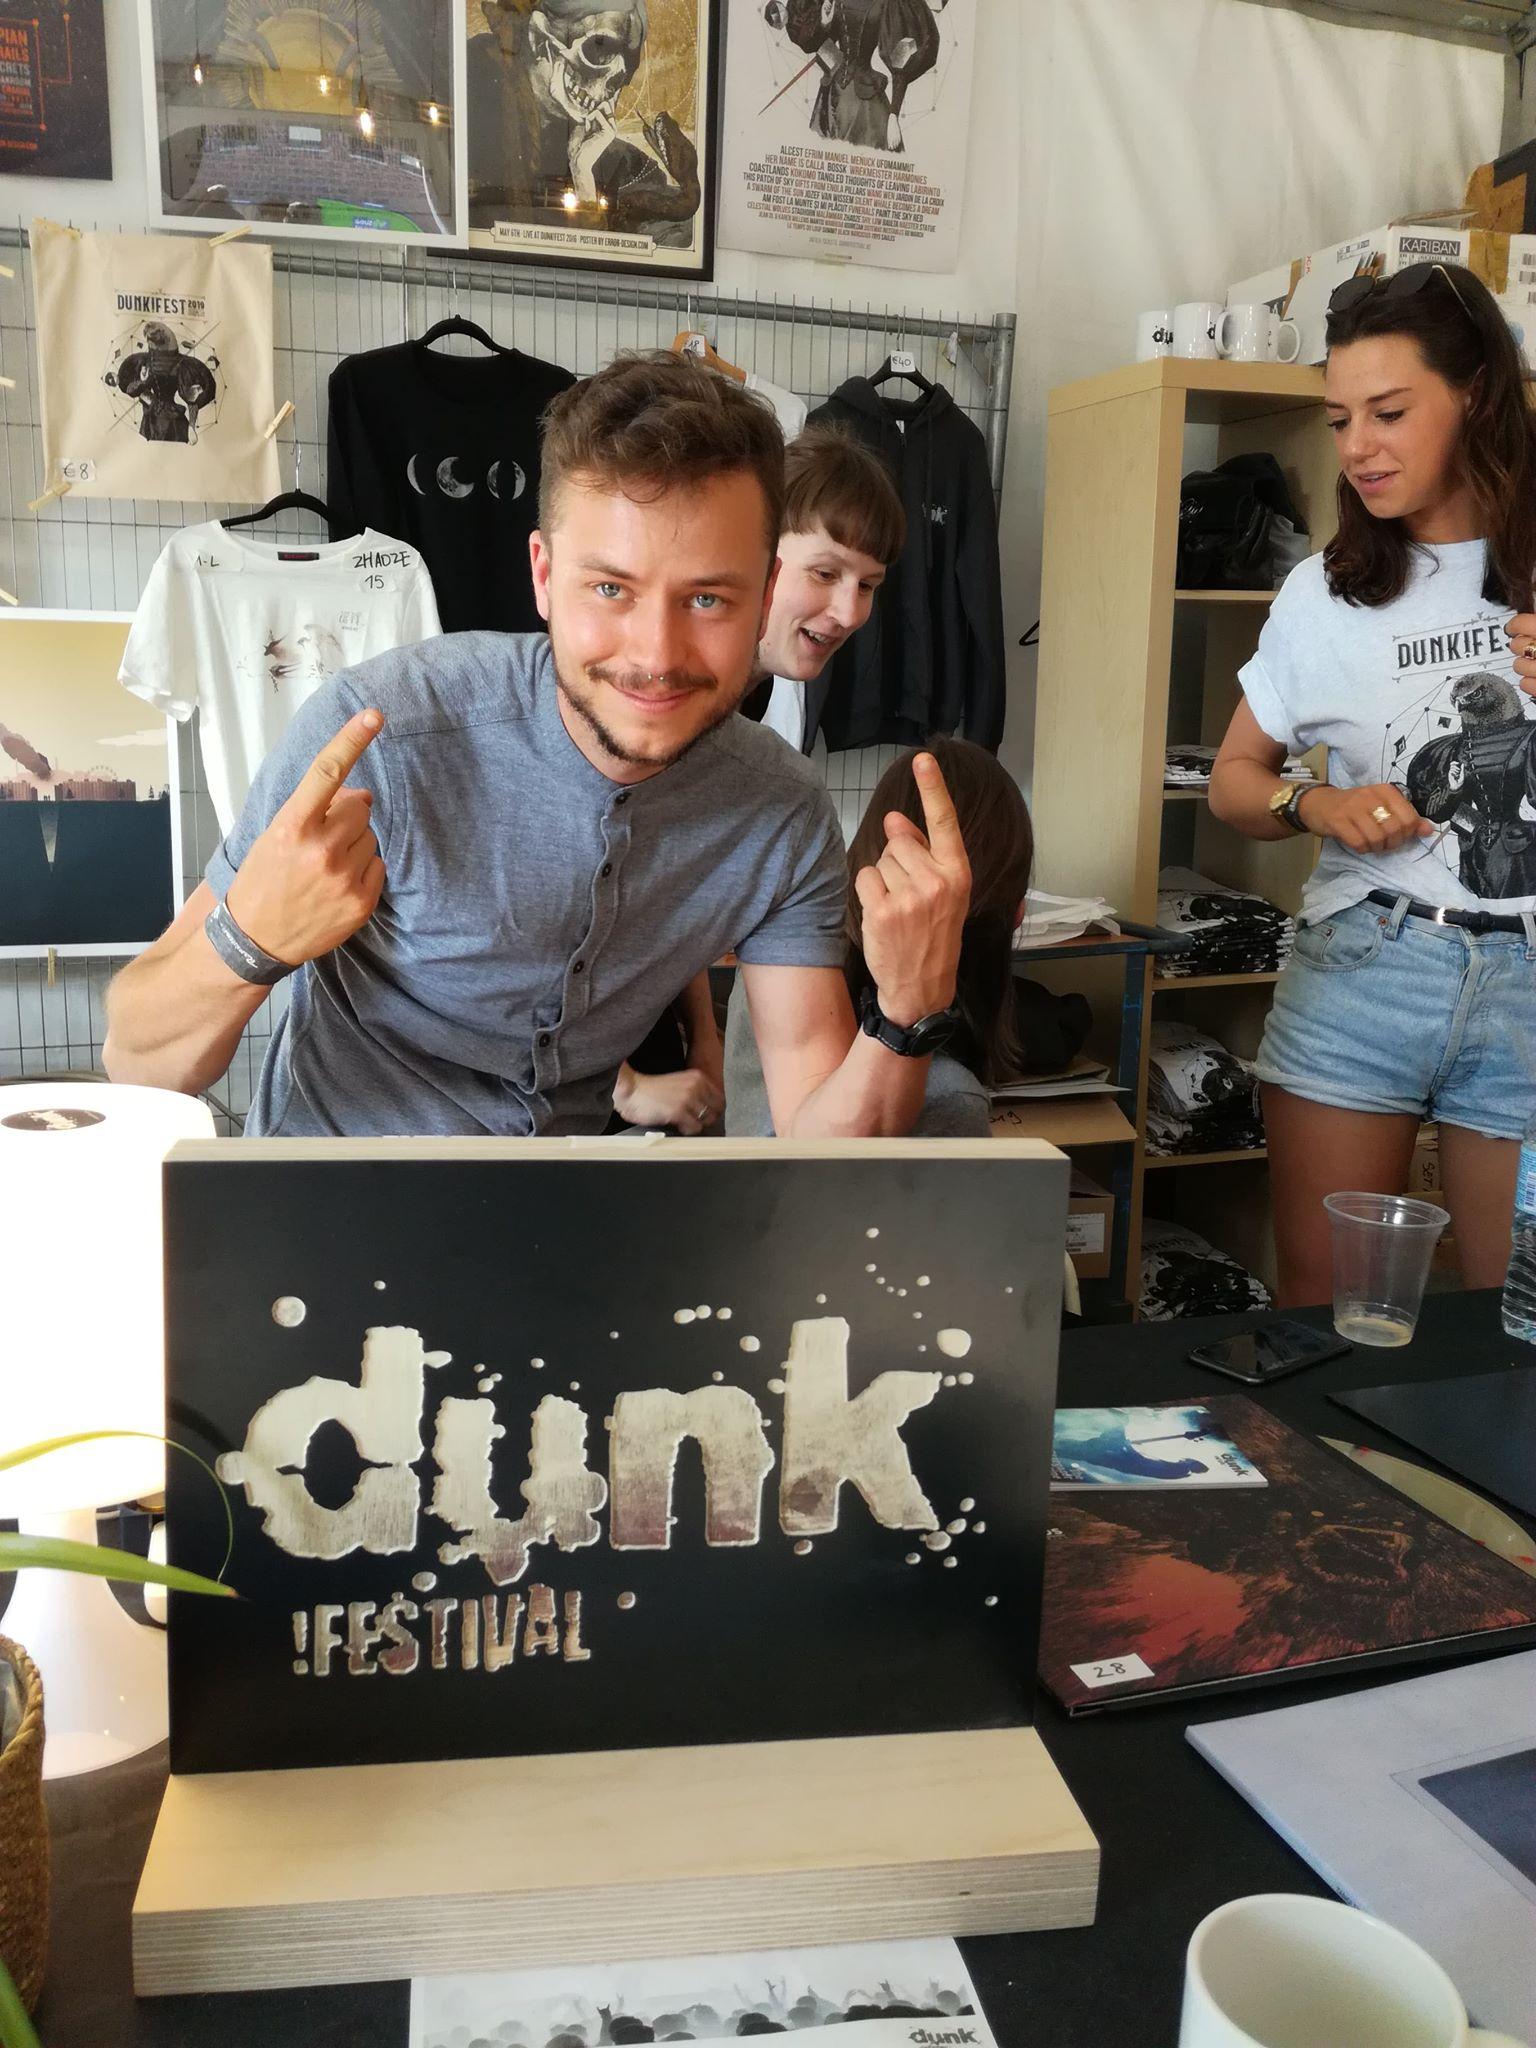 Display DUNK festival.jpg